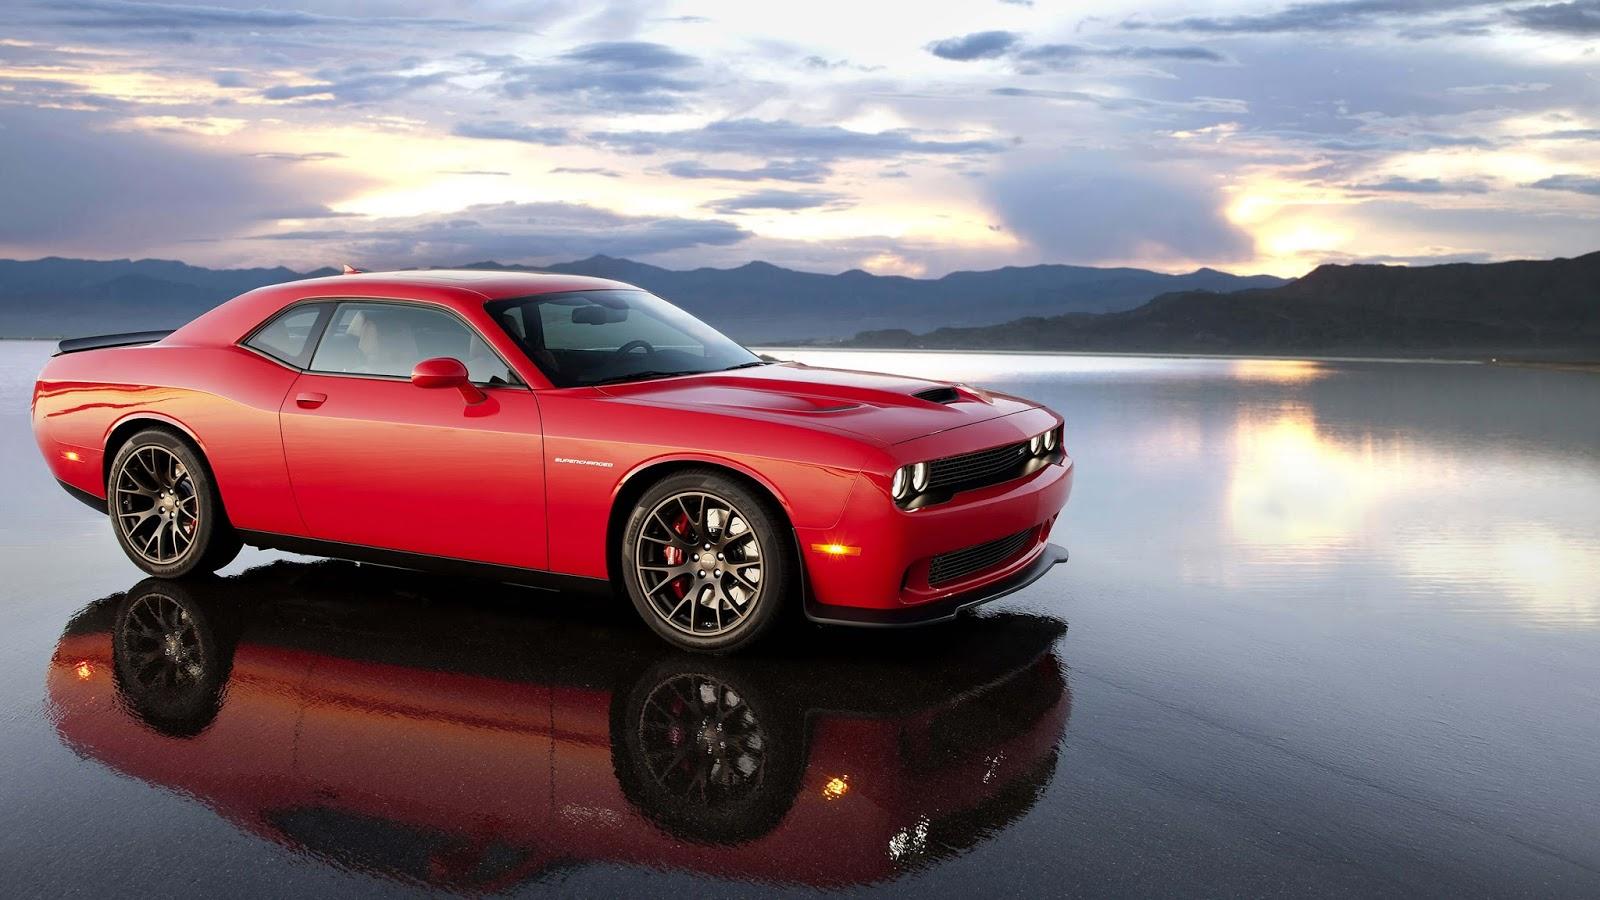 New 4k Wallpaper Hd Dodge Challenger For Desktop